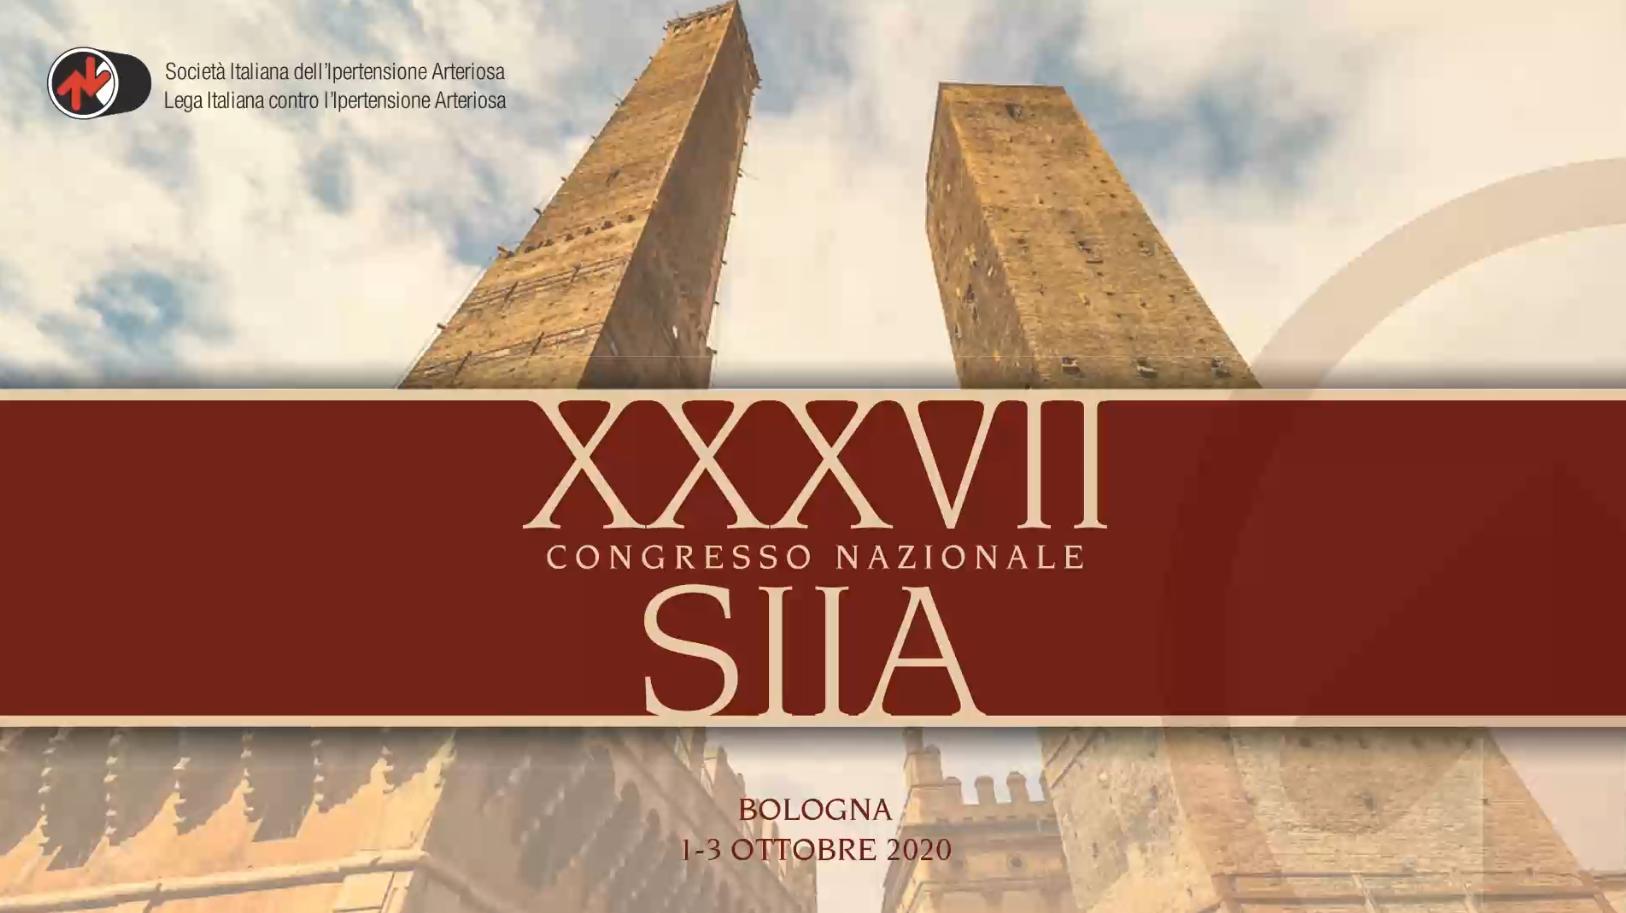 XXXVII Congresso SIIA – Digital Edition. Partecipa con noi!